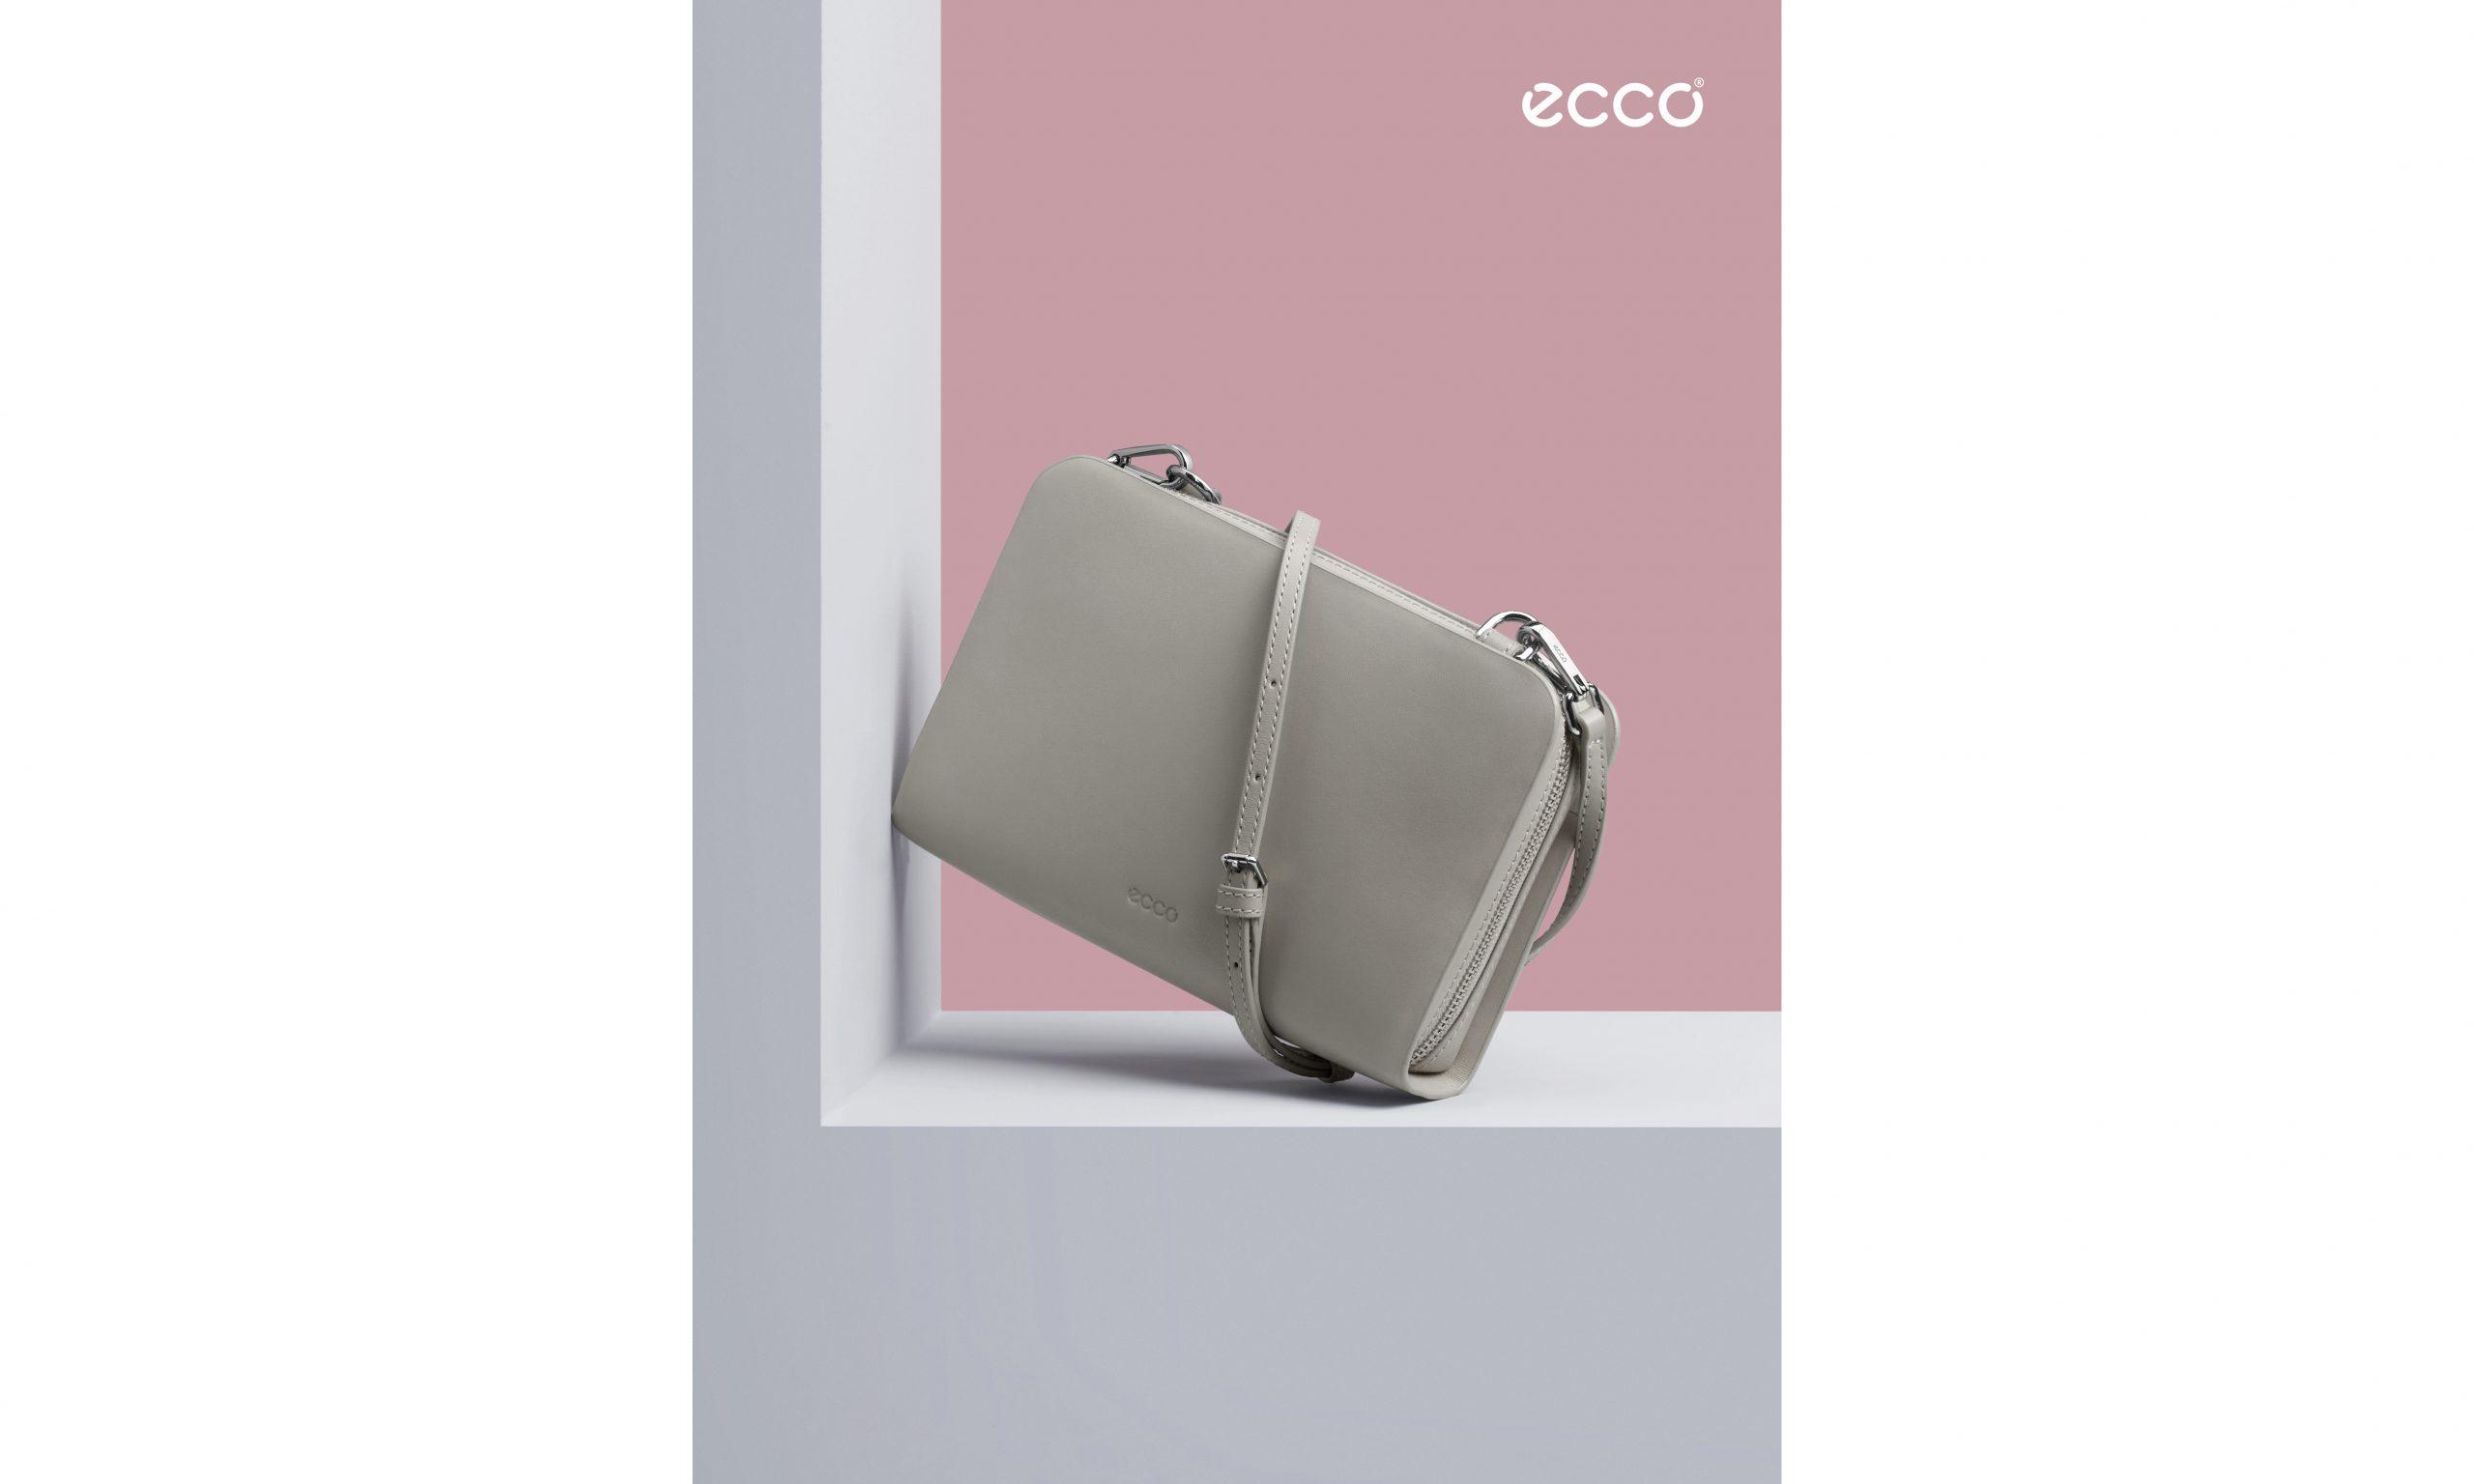 ECCO 发布 Ebba Crossbody 艾比系列斜挎包